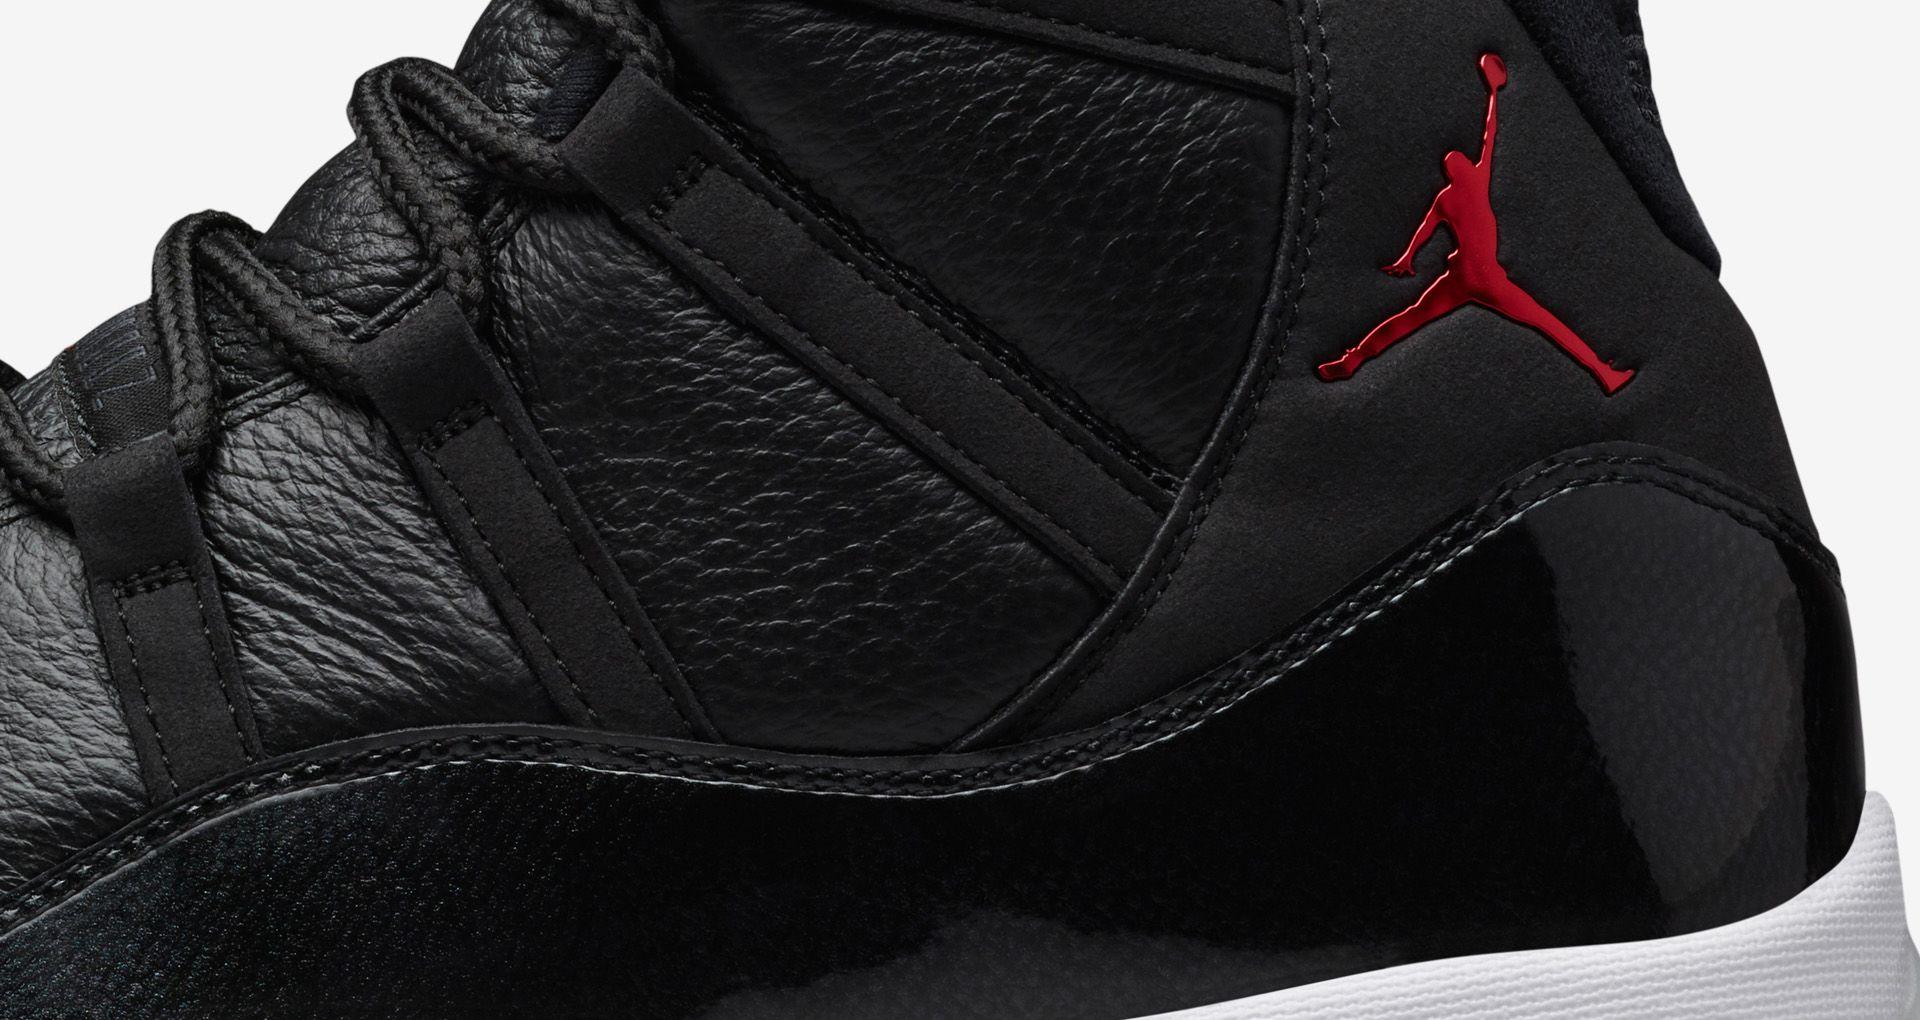 3b8a8d79018824 Air Jordan 11 Retro  72-10  Release Date. Nike+ SNKRS